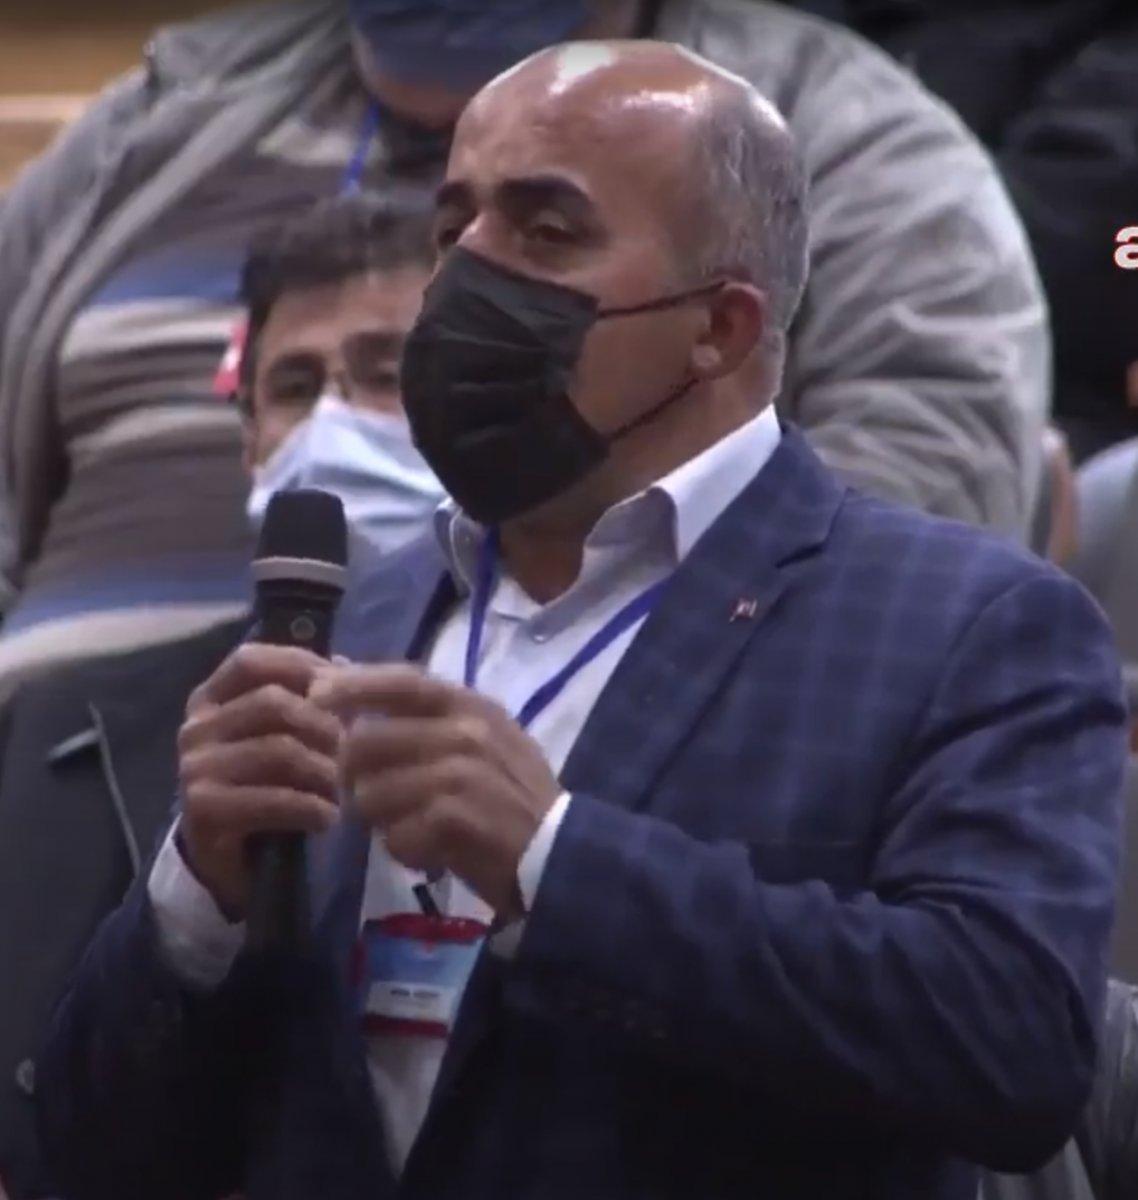 Sinoplu muhtardan Kemal Kılıçdaroğlu na HDP tepkisi #2